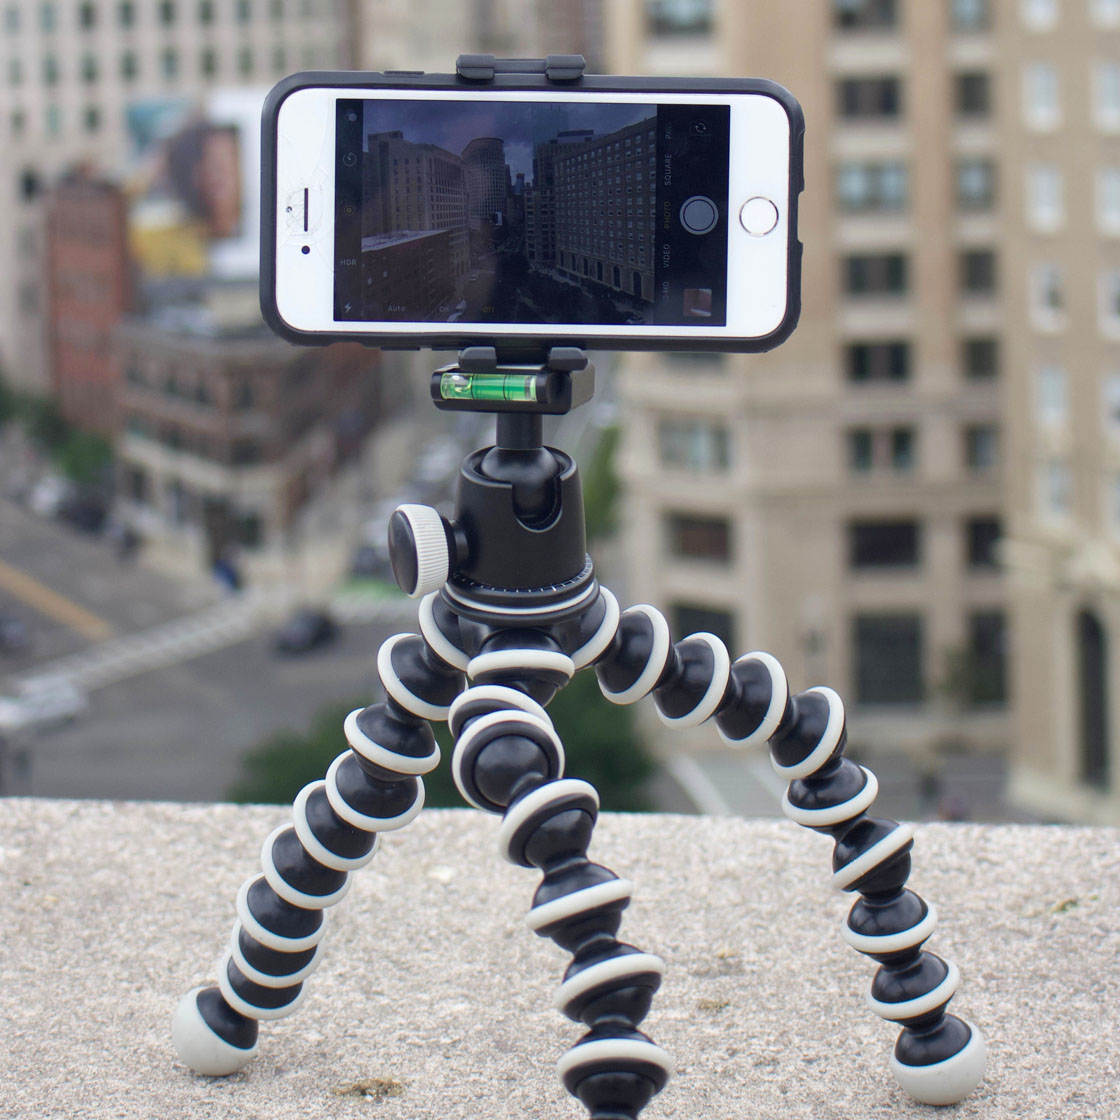 Iphone time lapse 11 no script